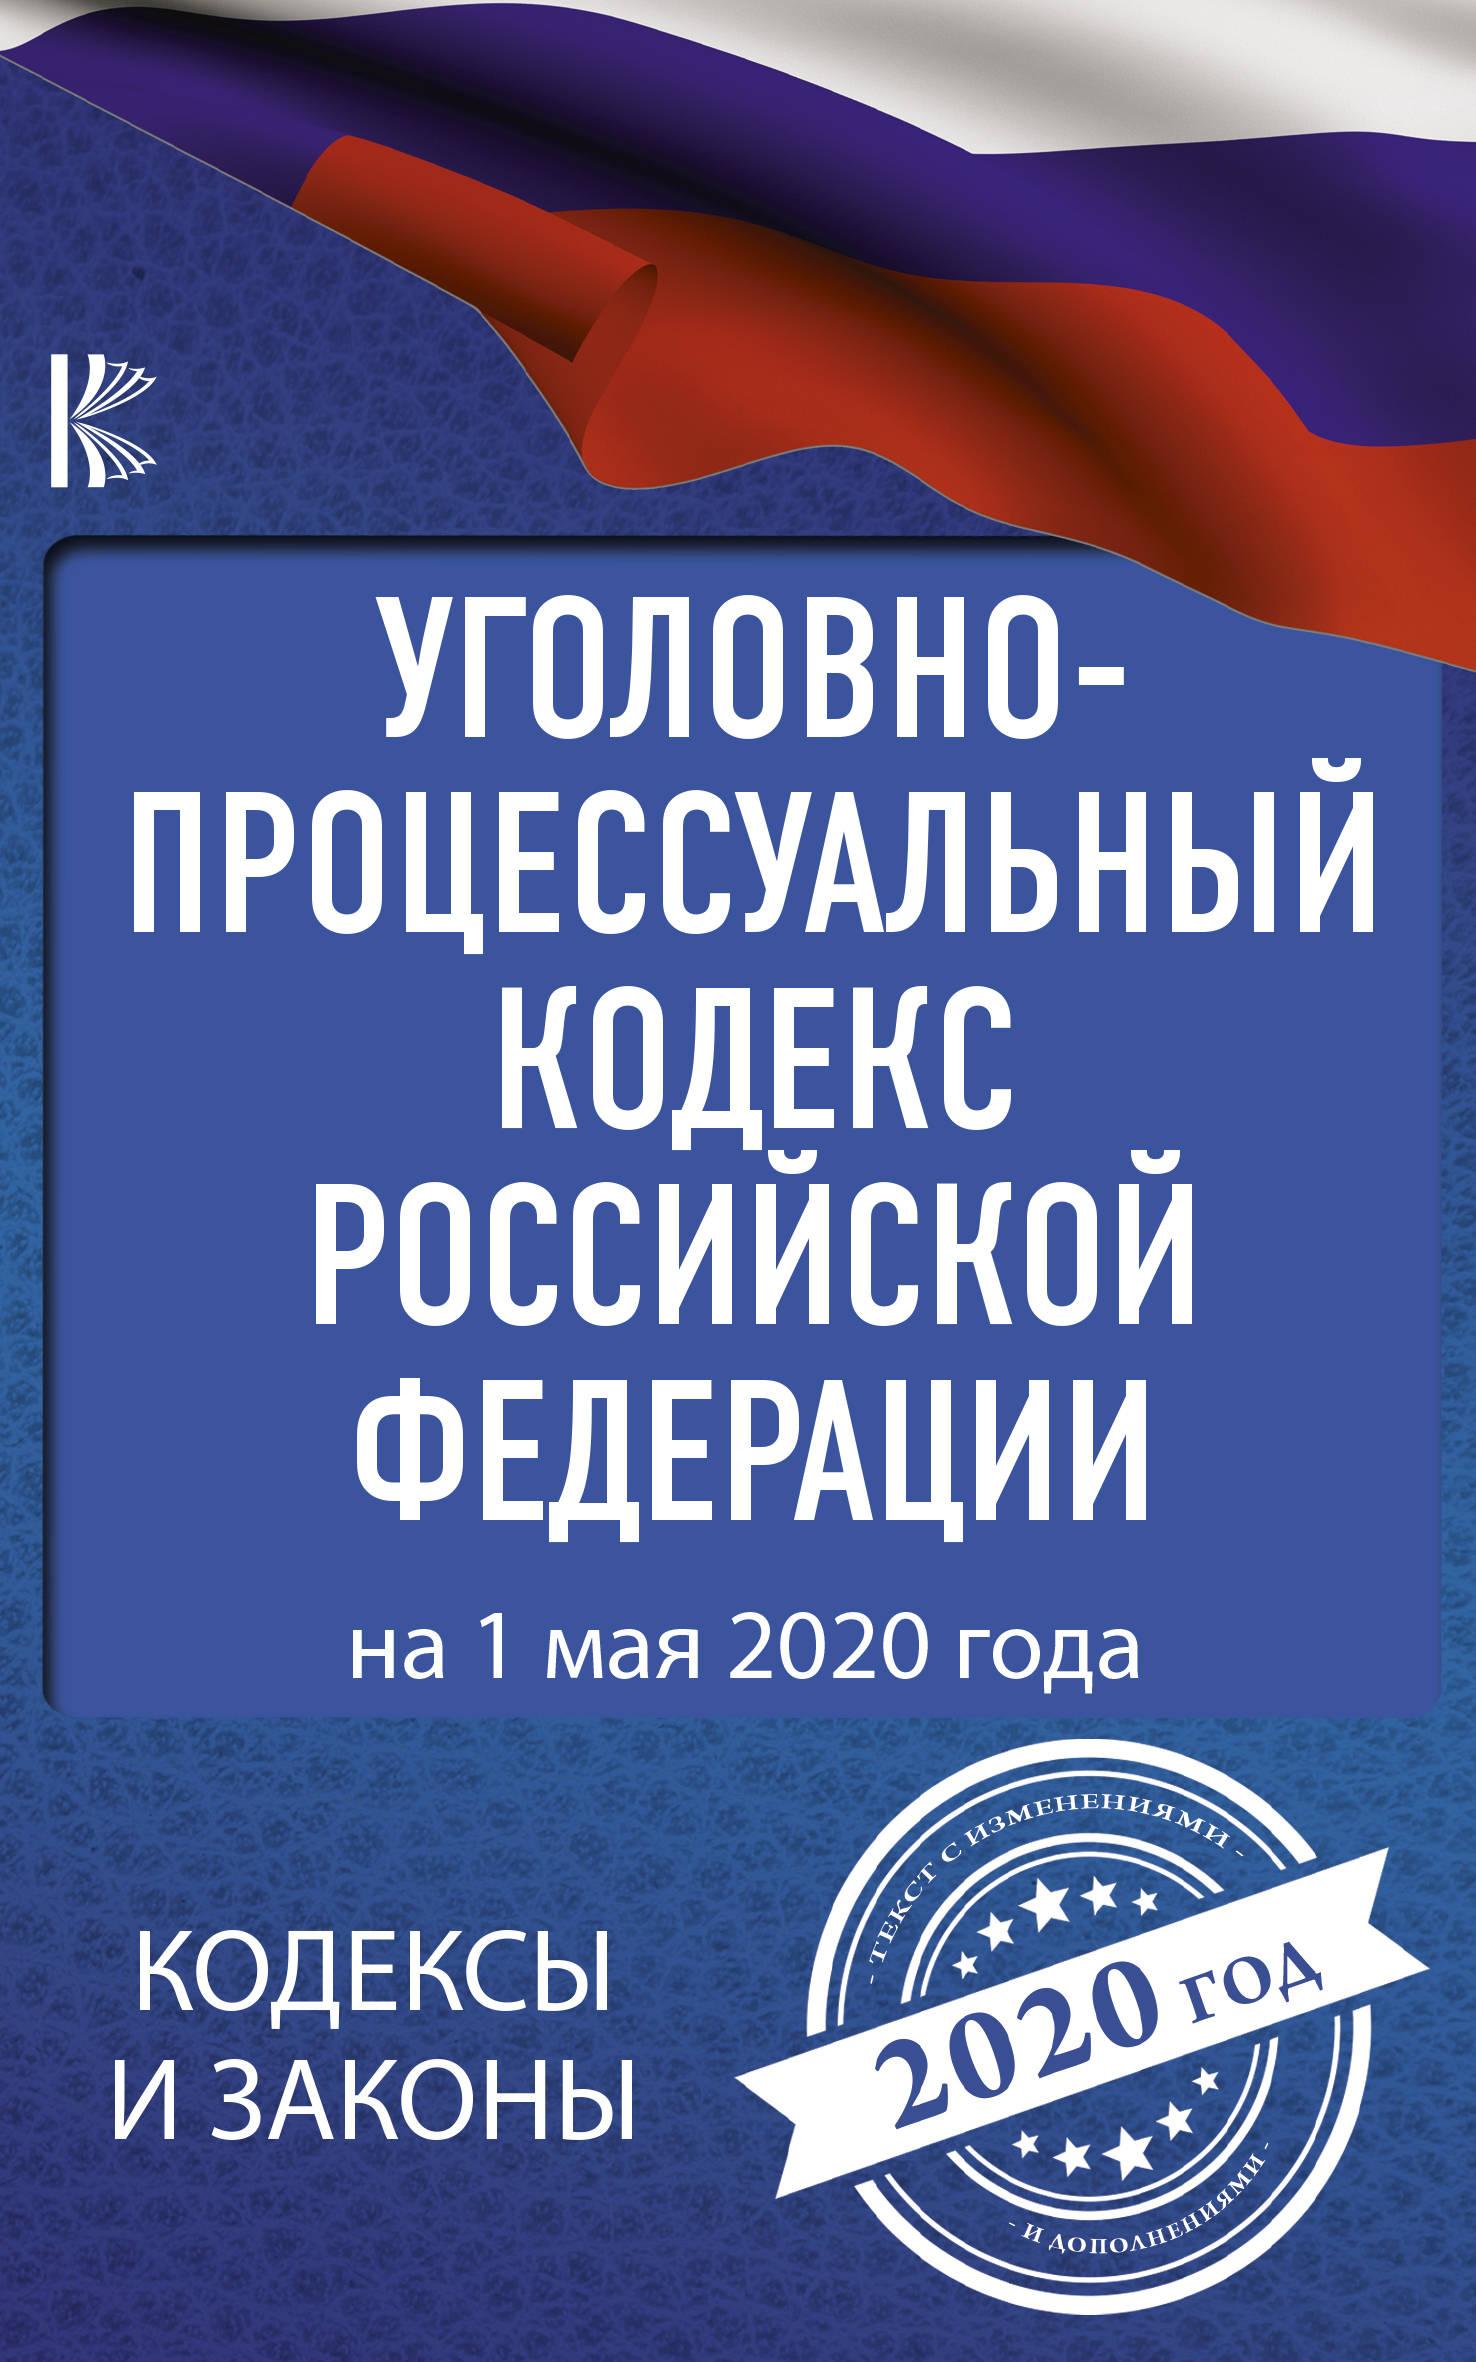 Ugolovno-protsessualnyj kodeks Rossijskoj Federatsii na 1 maja 2020 goda